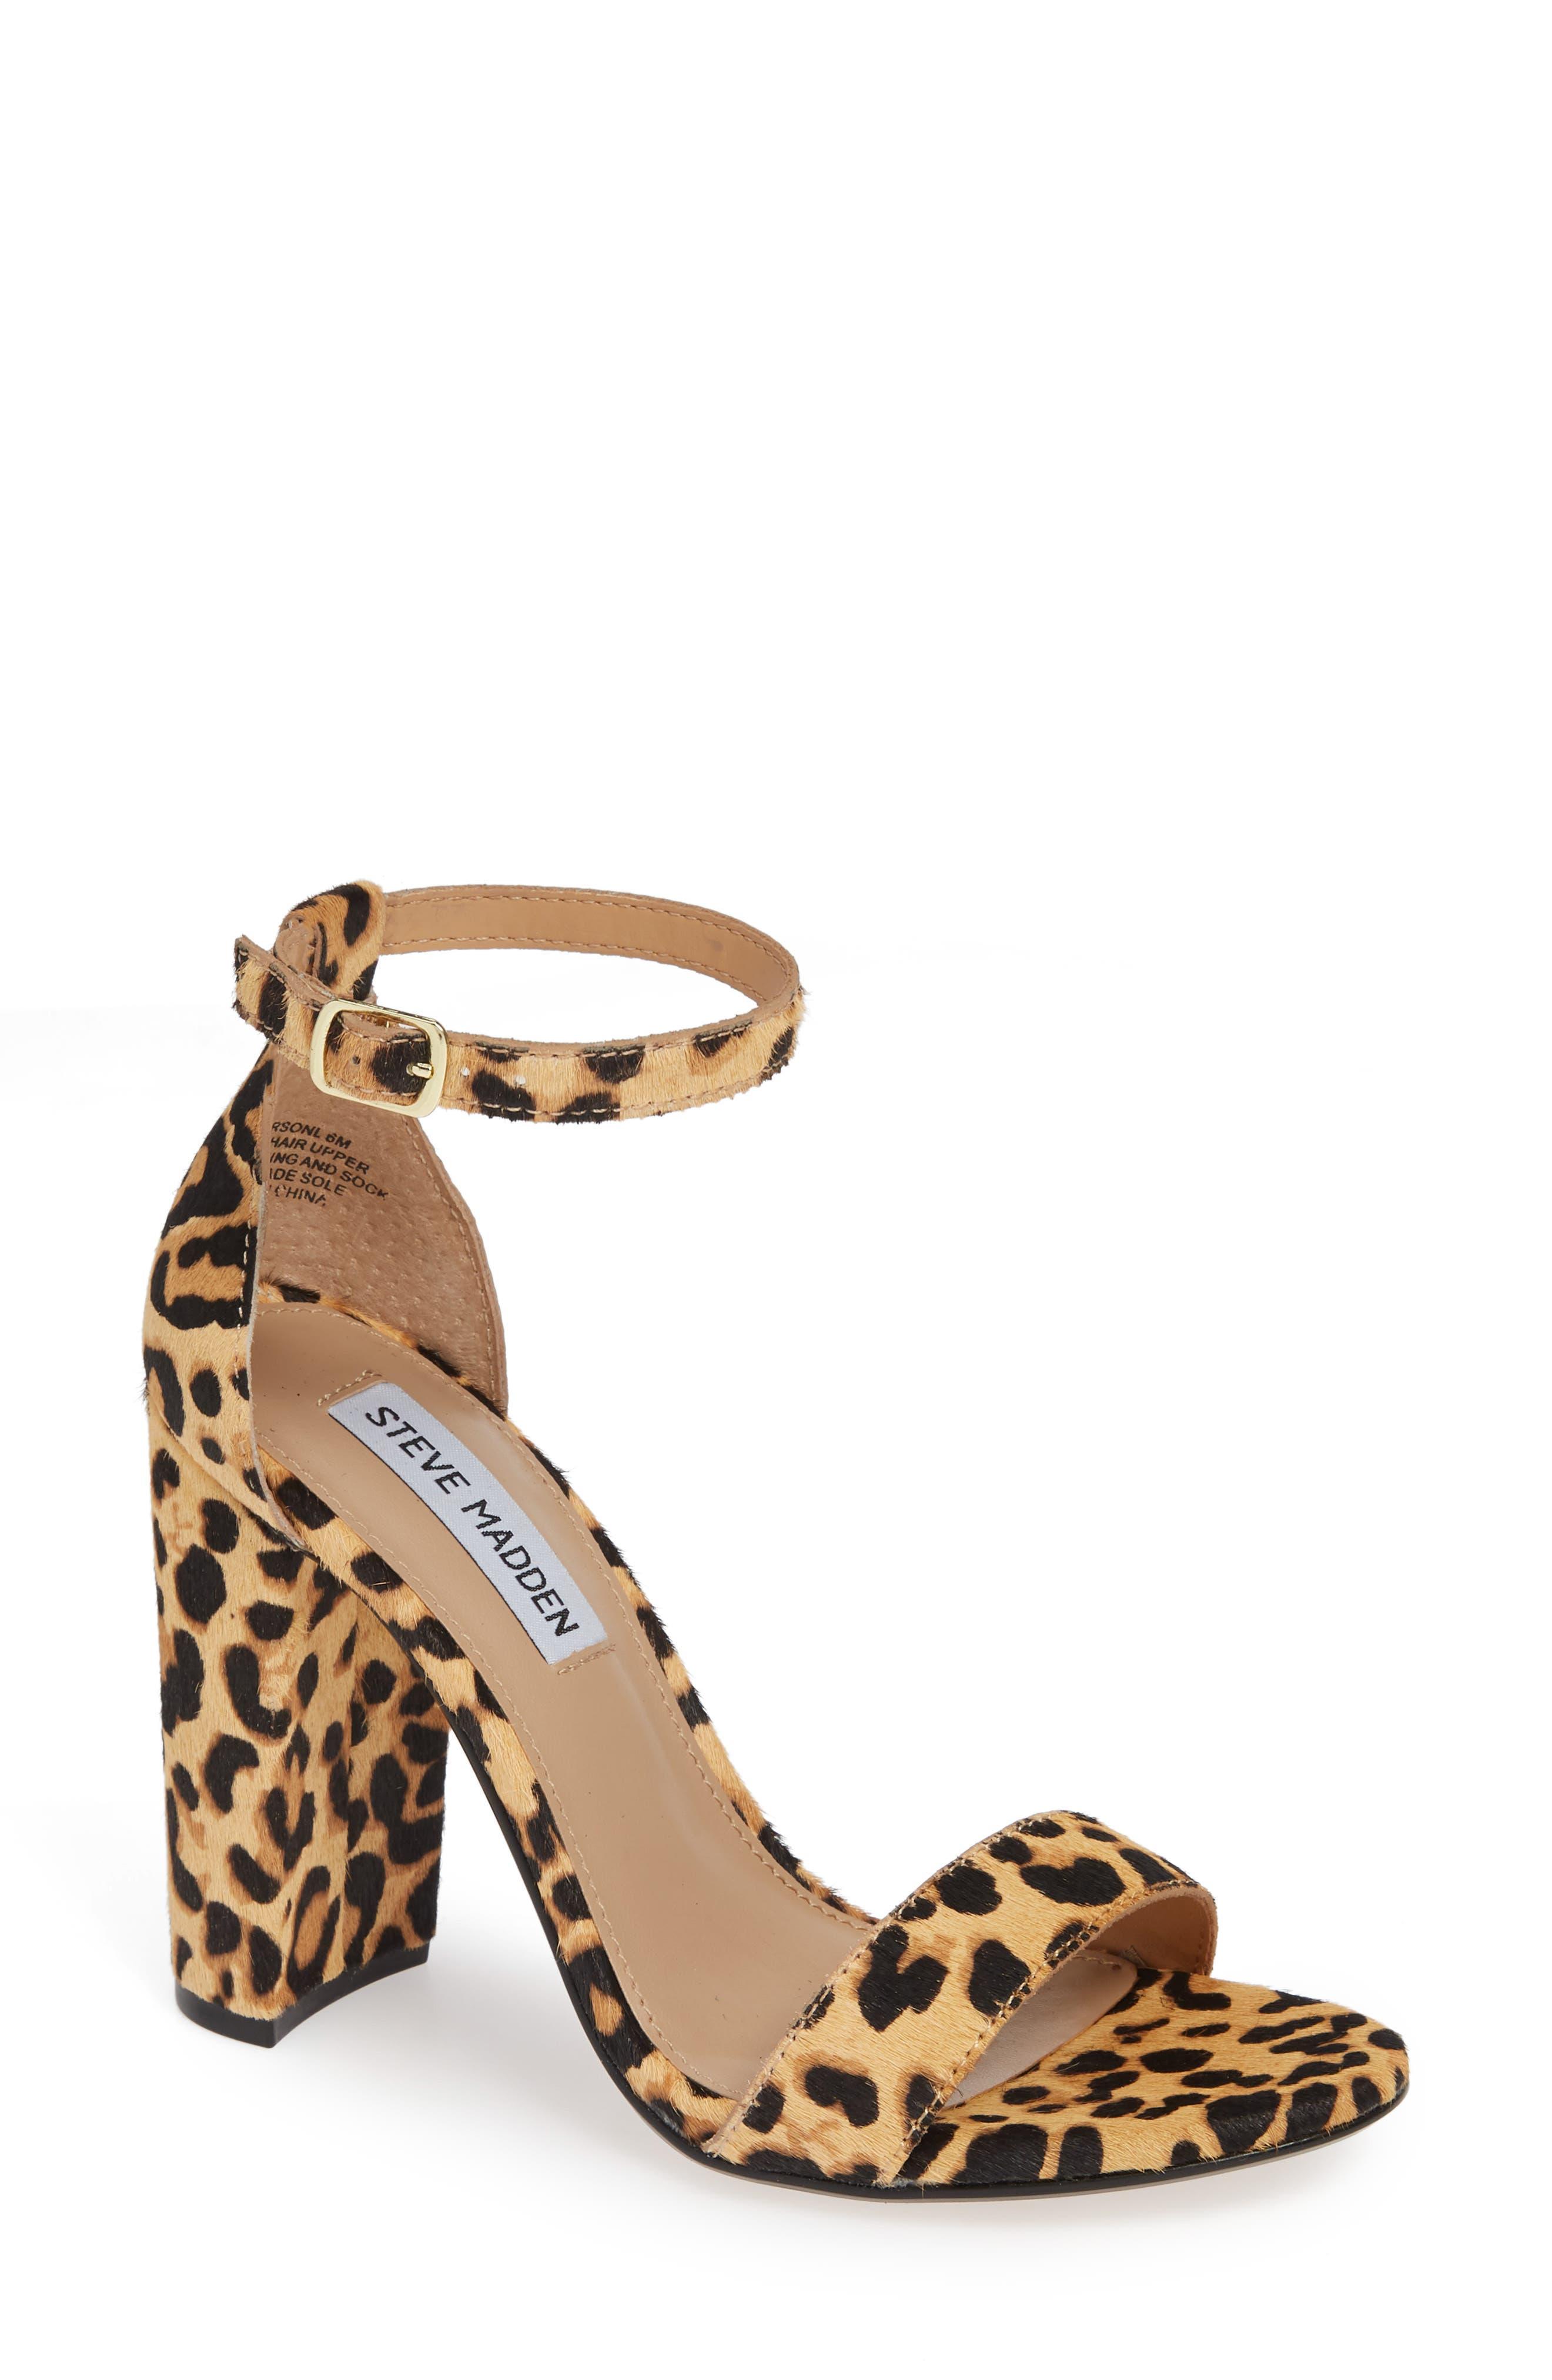 ec80f7010c5 Steve Madden Women s Heels